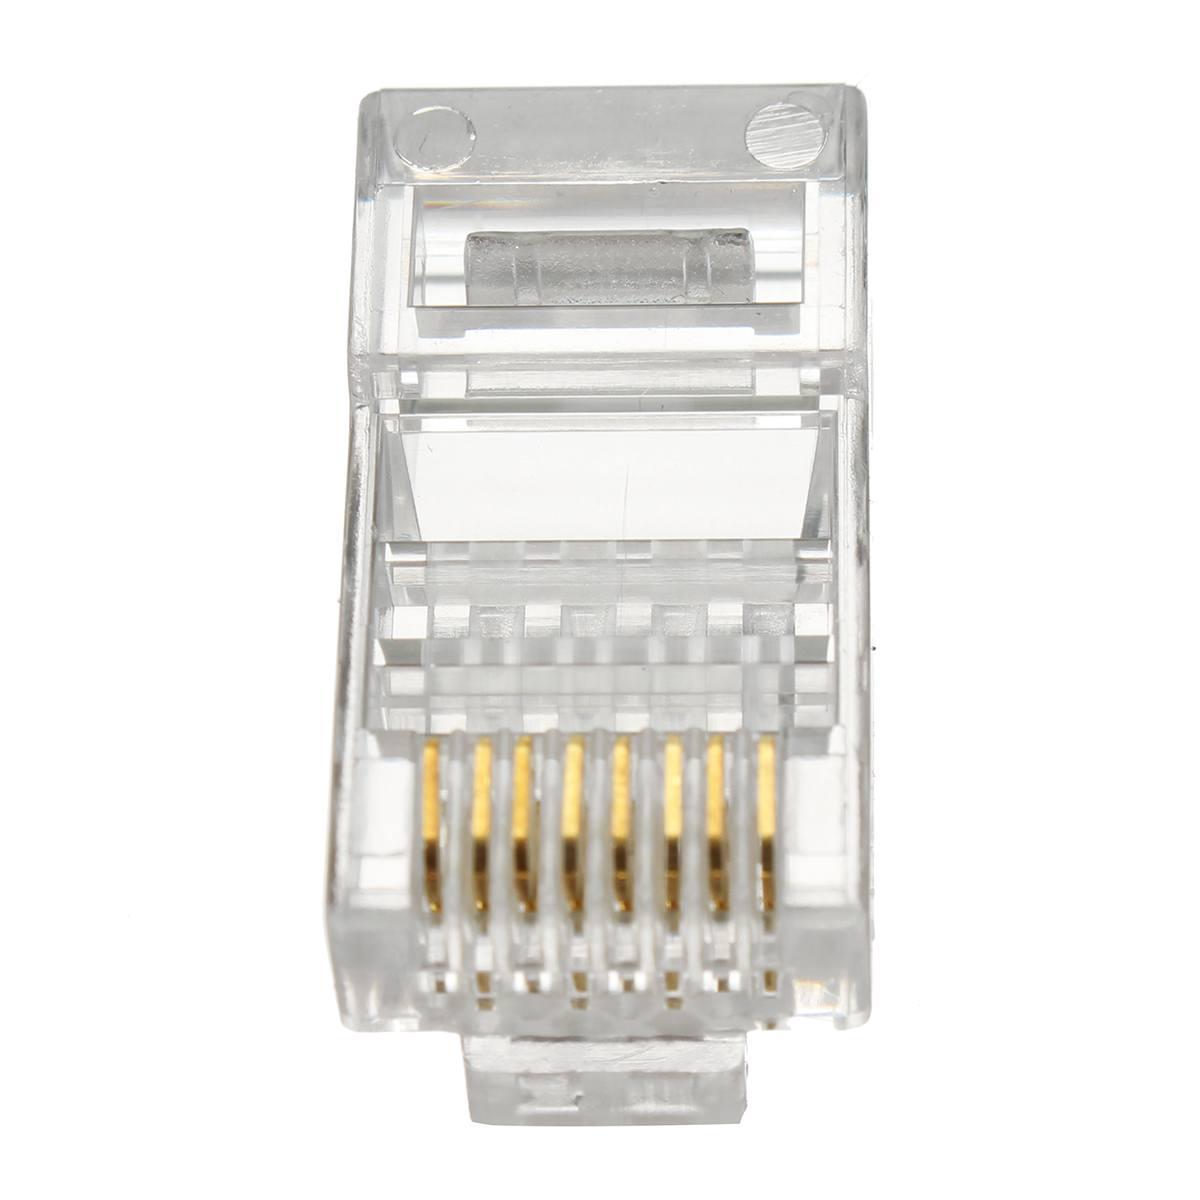 1000 CAT6 EZ RJ45 Network Shielded Modular Plug 8P8C Connector End Pass Through